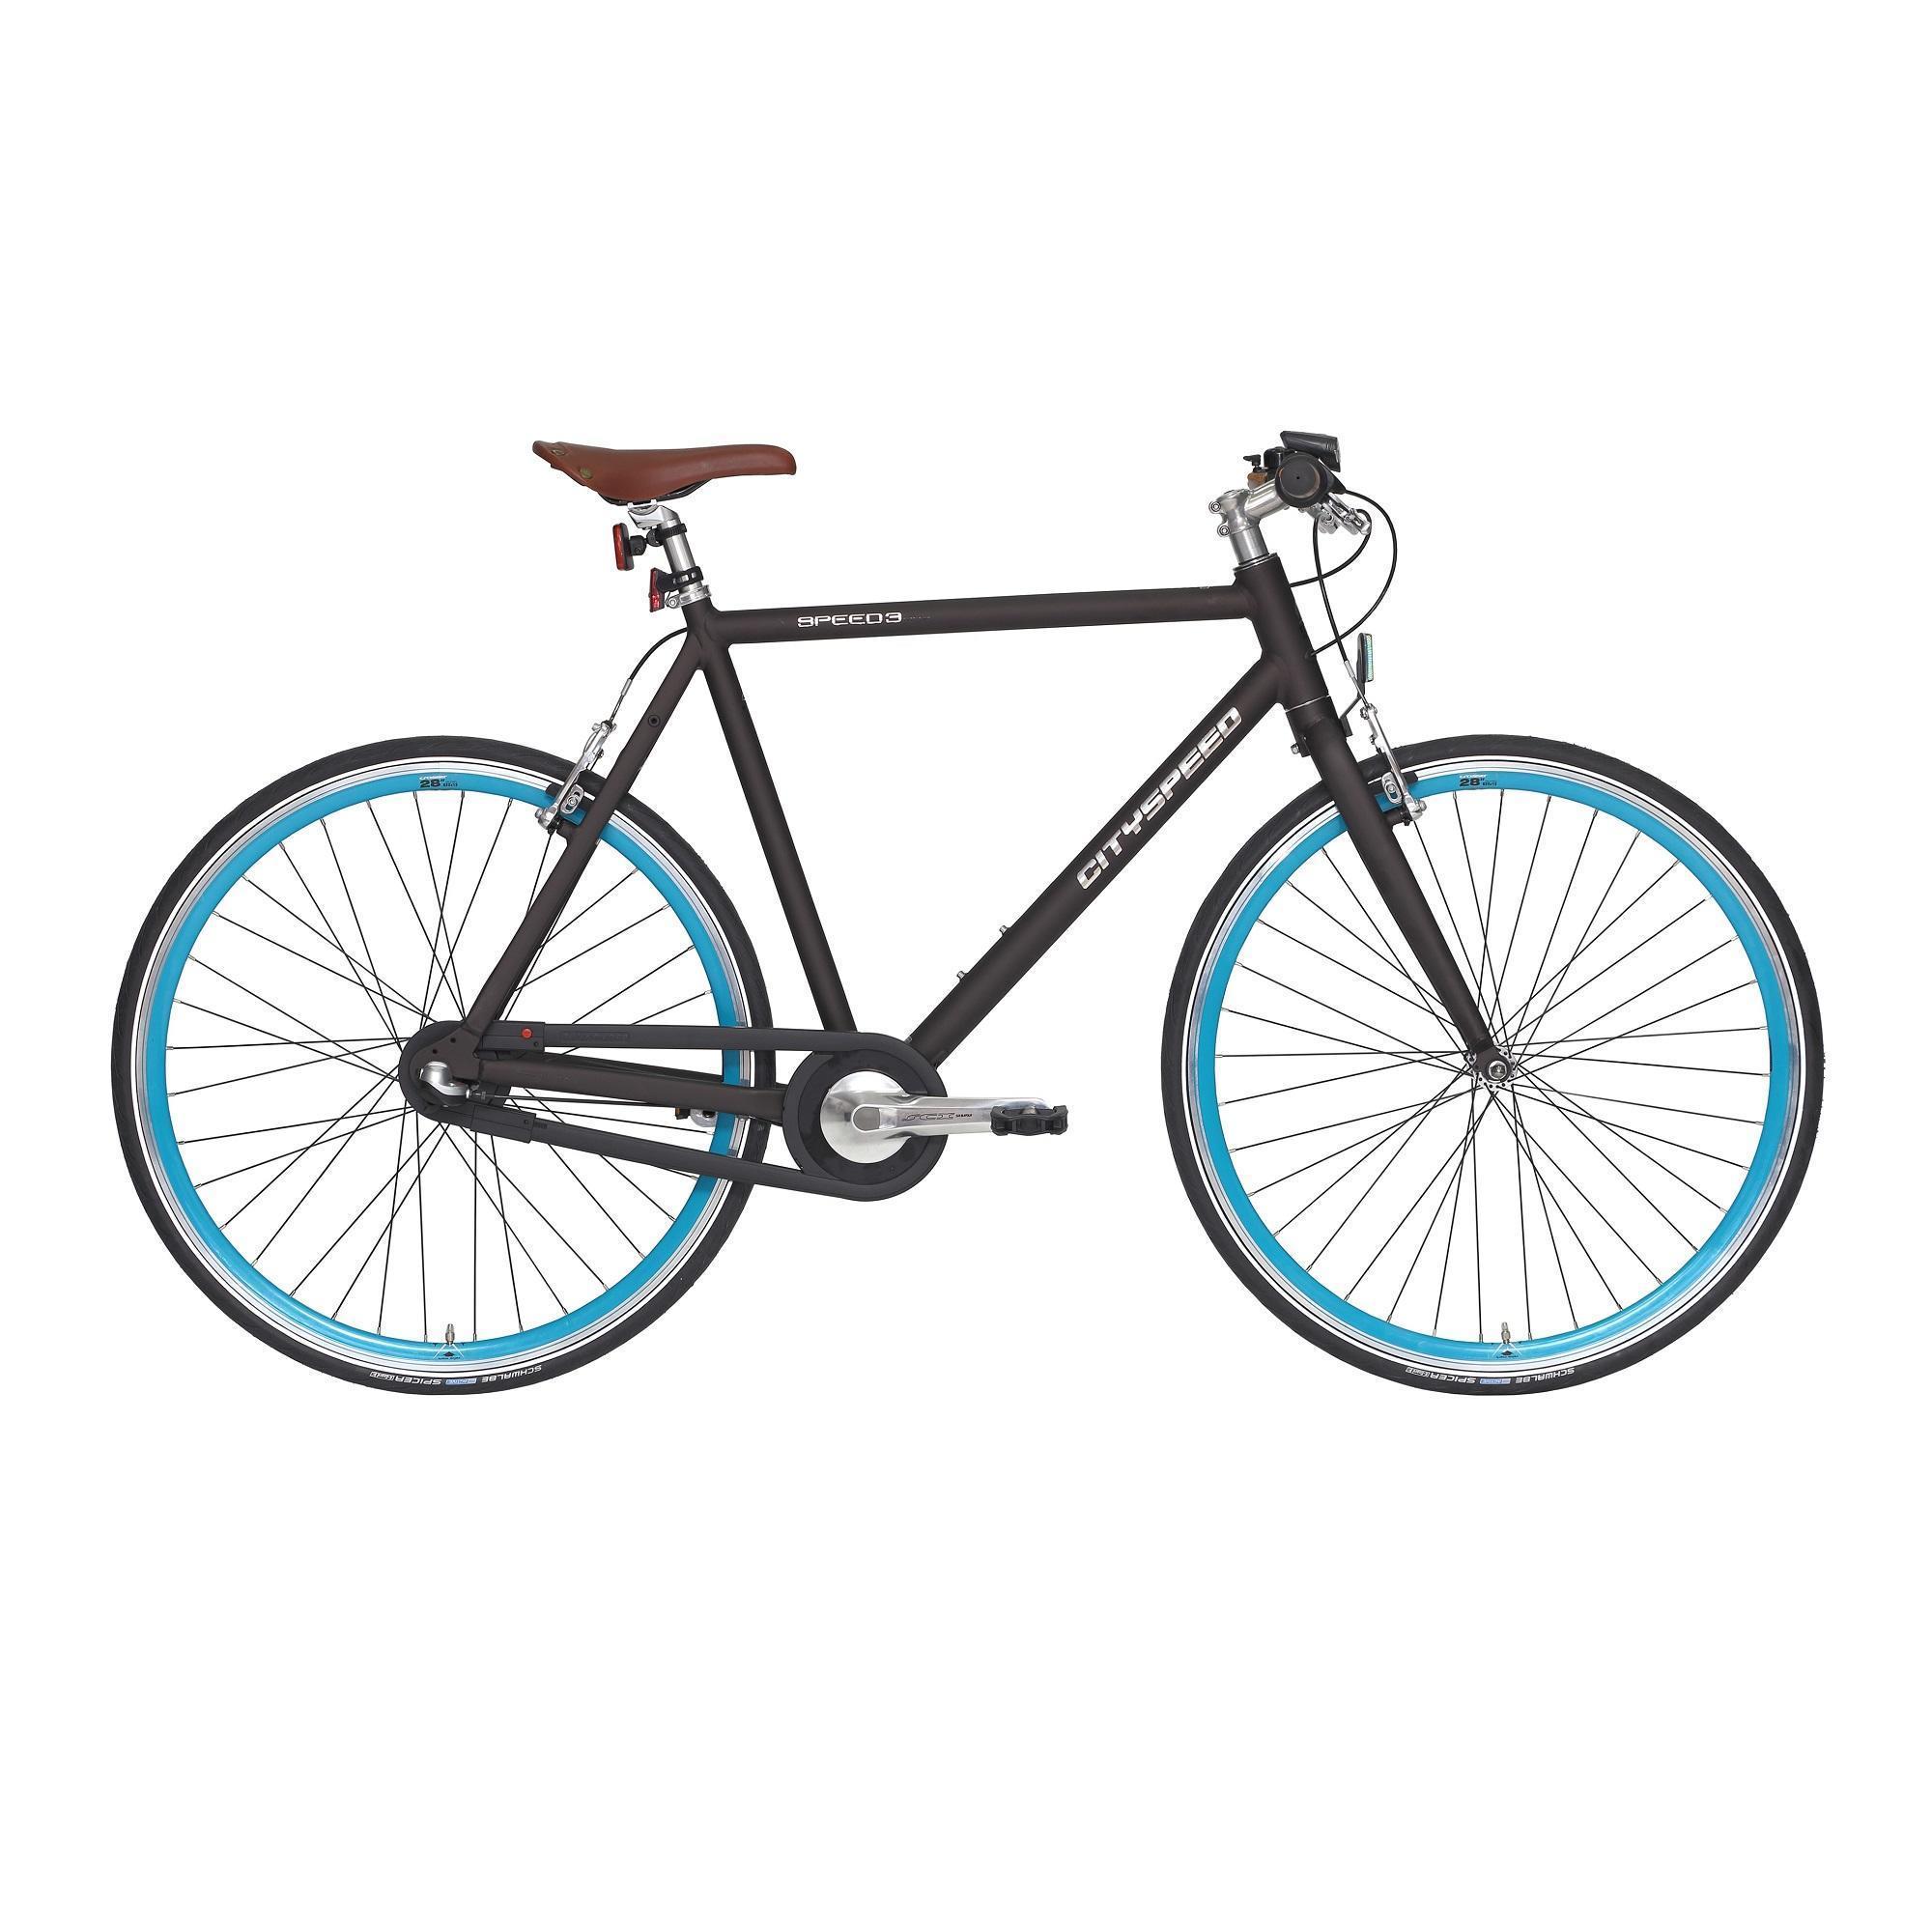 Decathlon City Bike 28 Zoll City Speed Nexus 3 - Dunkelgrau, Weiß oder Mint